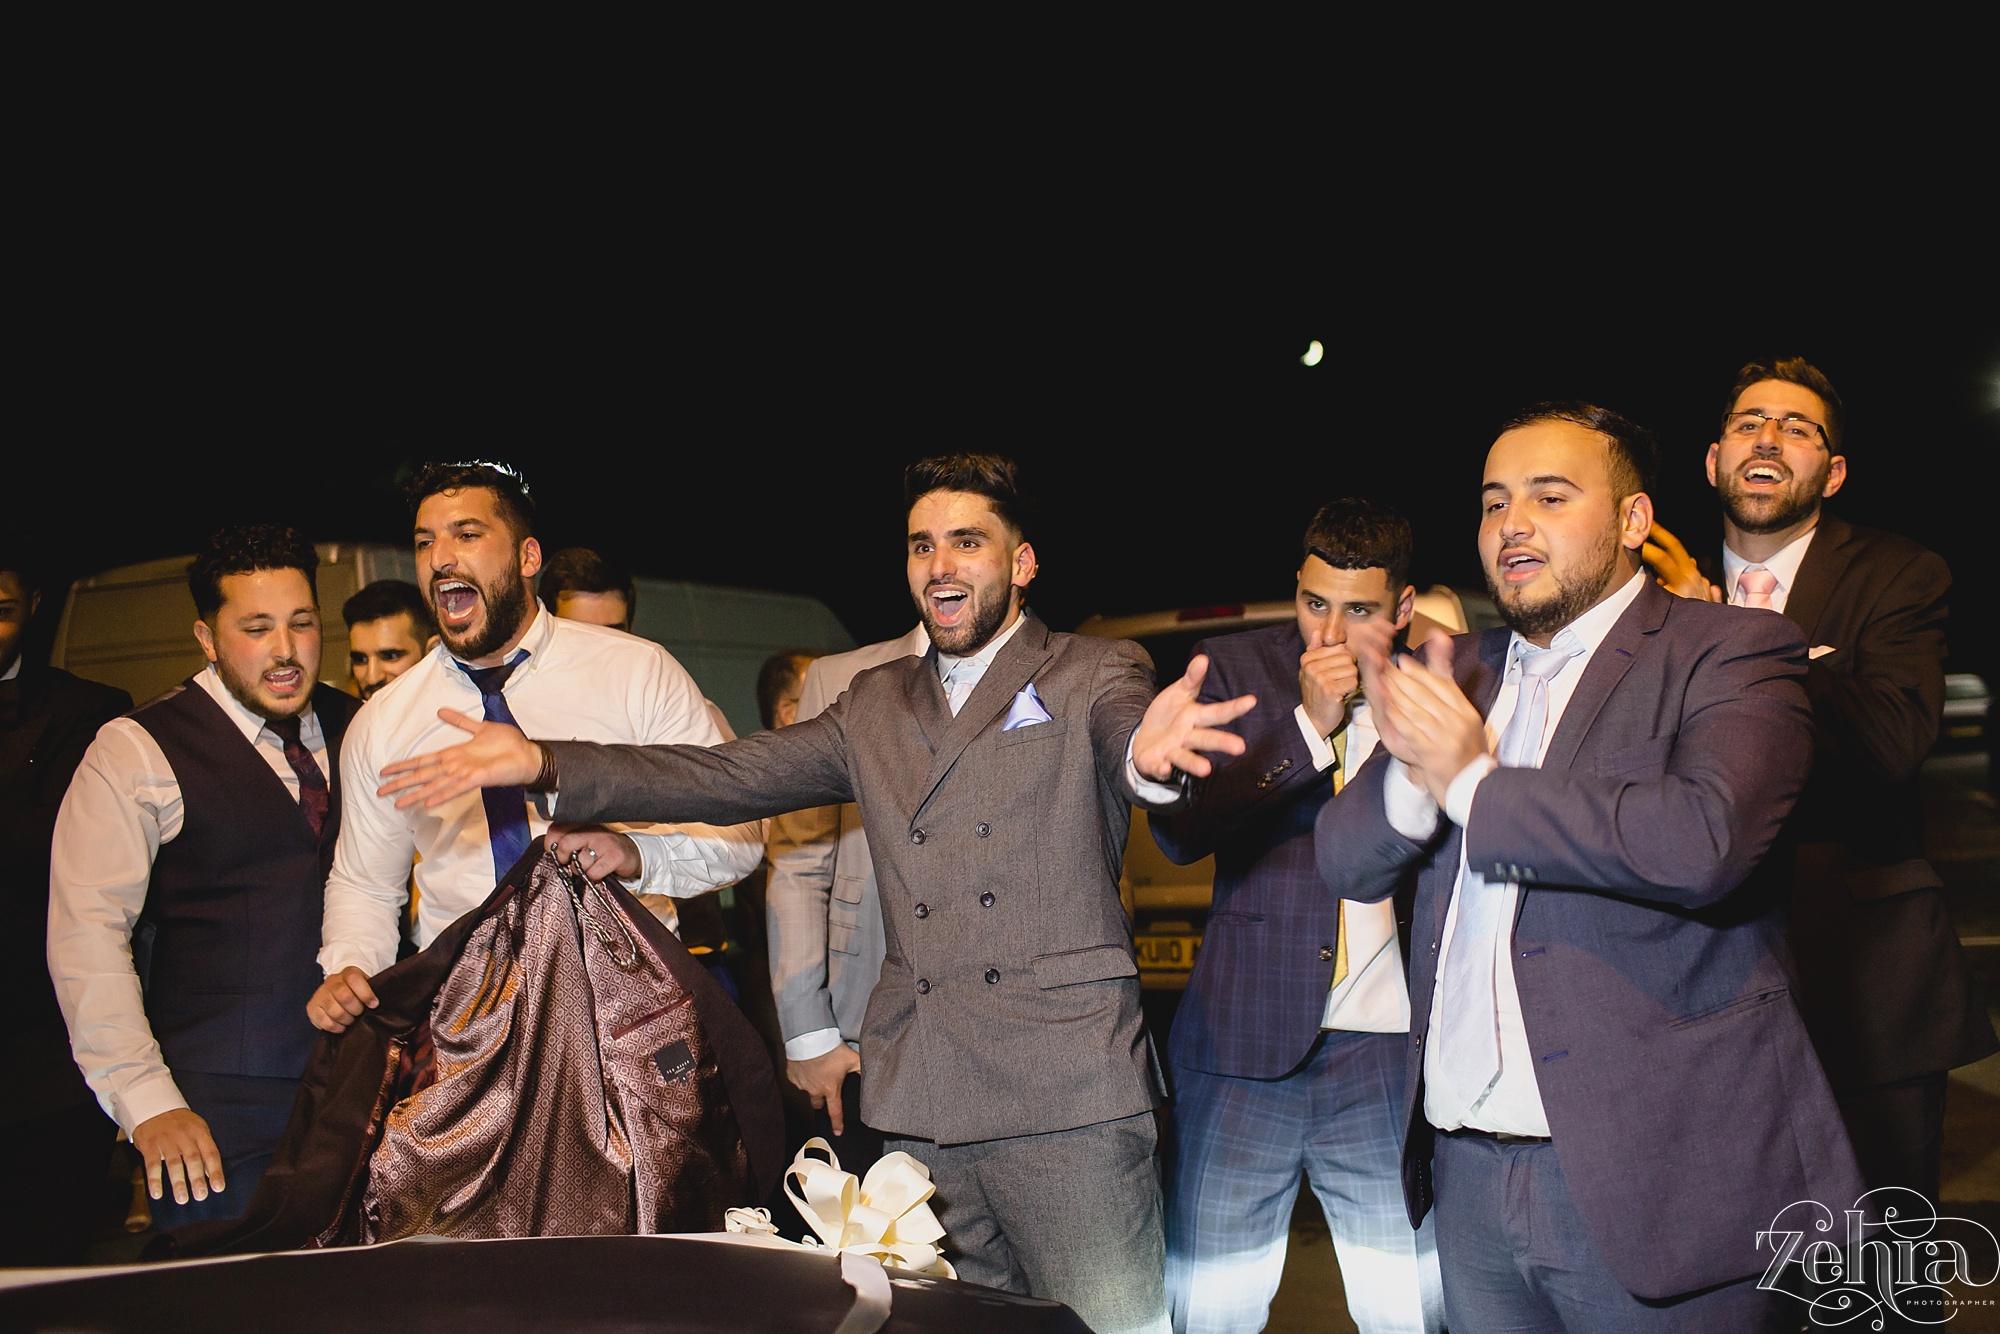 zehra photographer mere cheshire wedding_0067.jpg